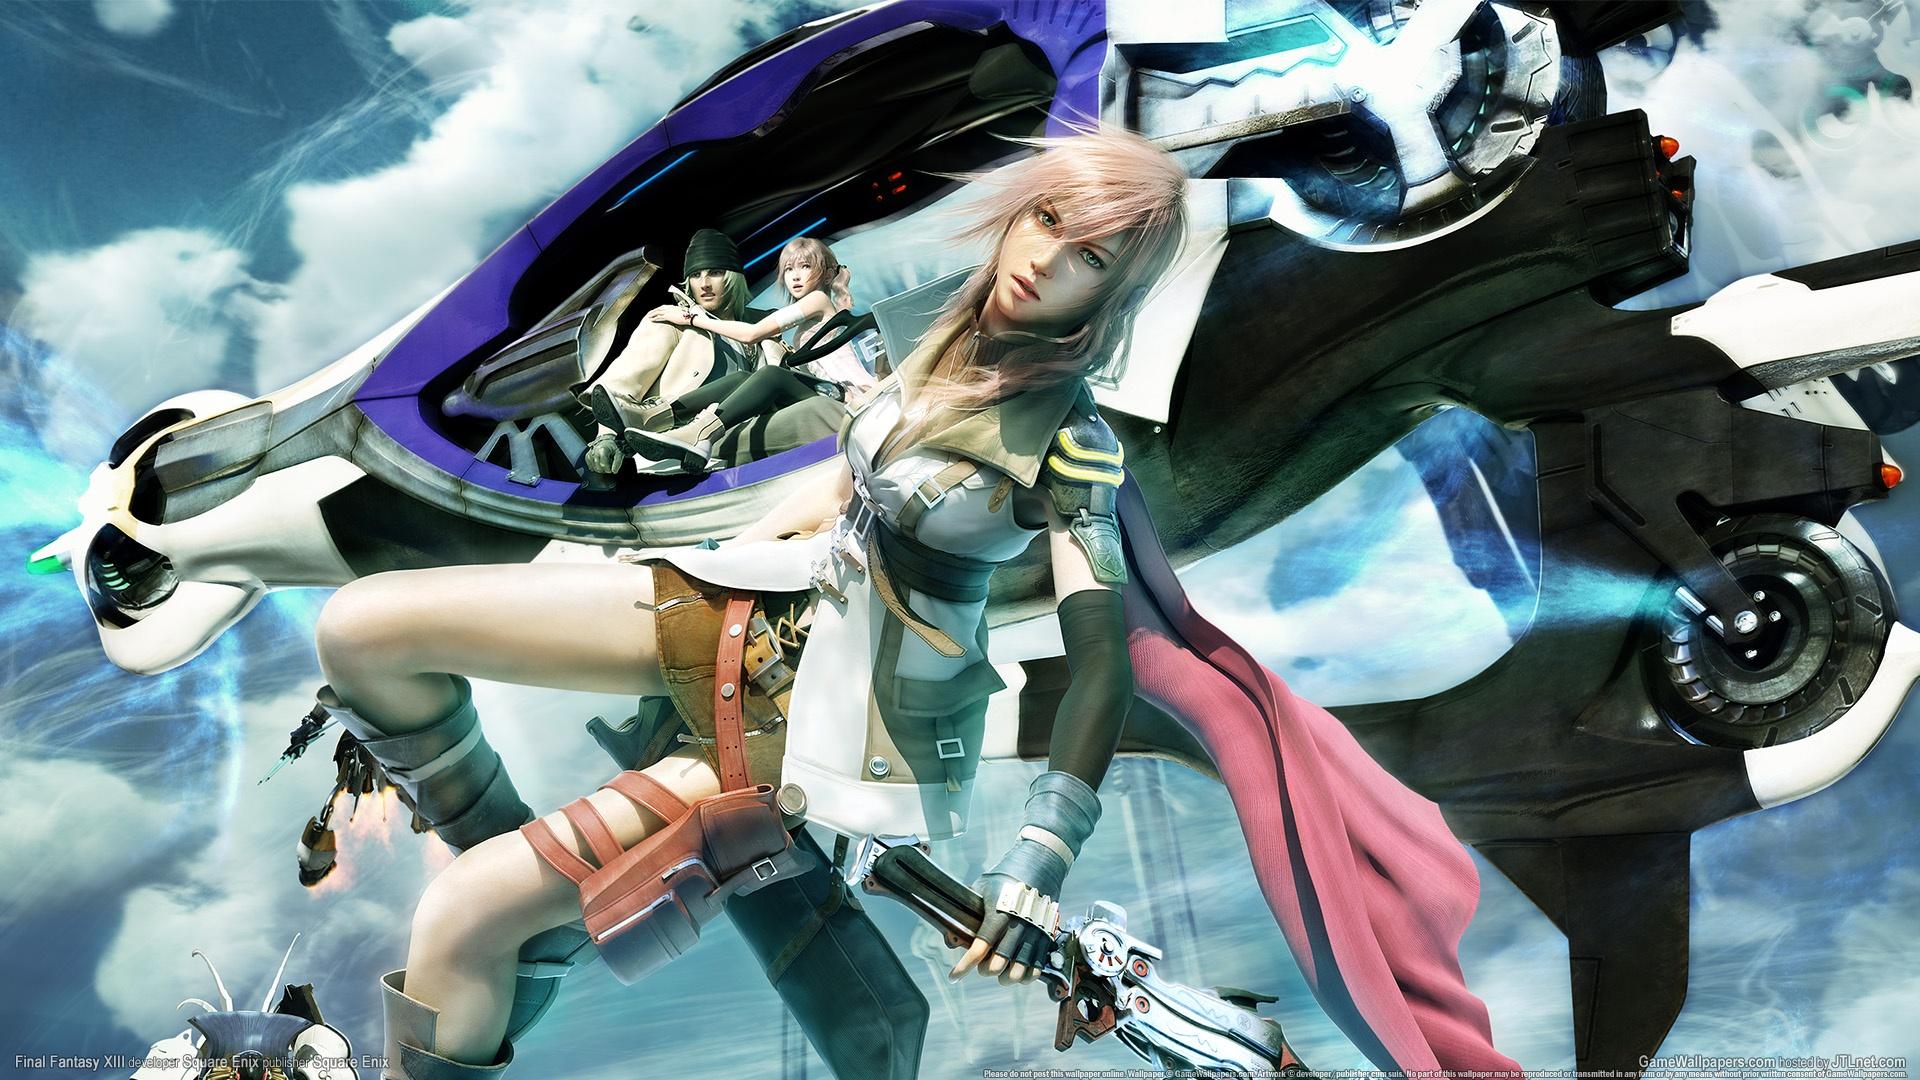 Final Fantasy XIII Wallpaper PS3 Game 3 HD Desktop Wallpapers 1920x1080